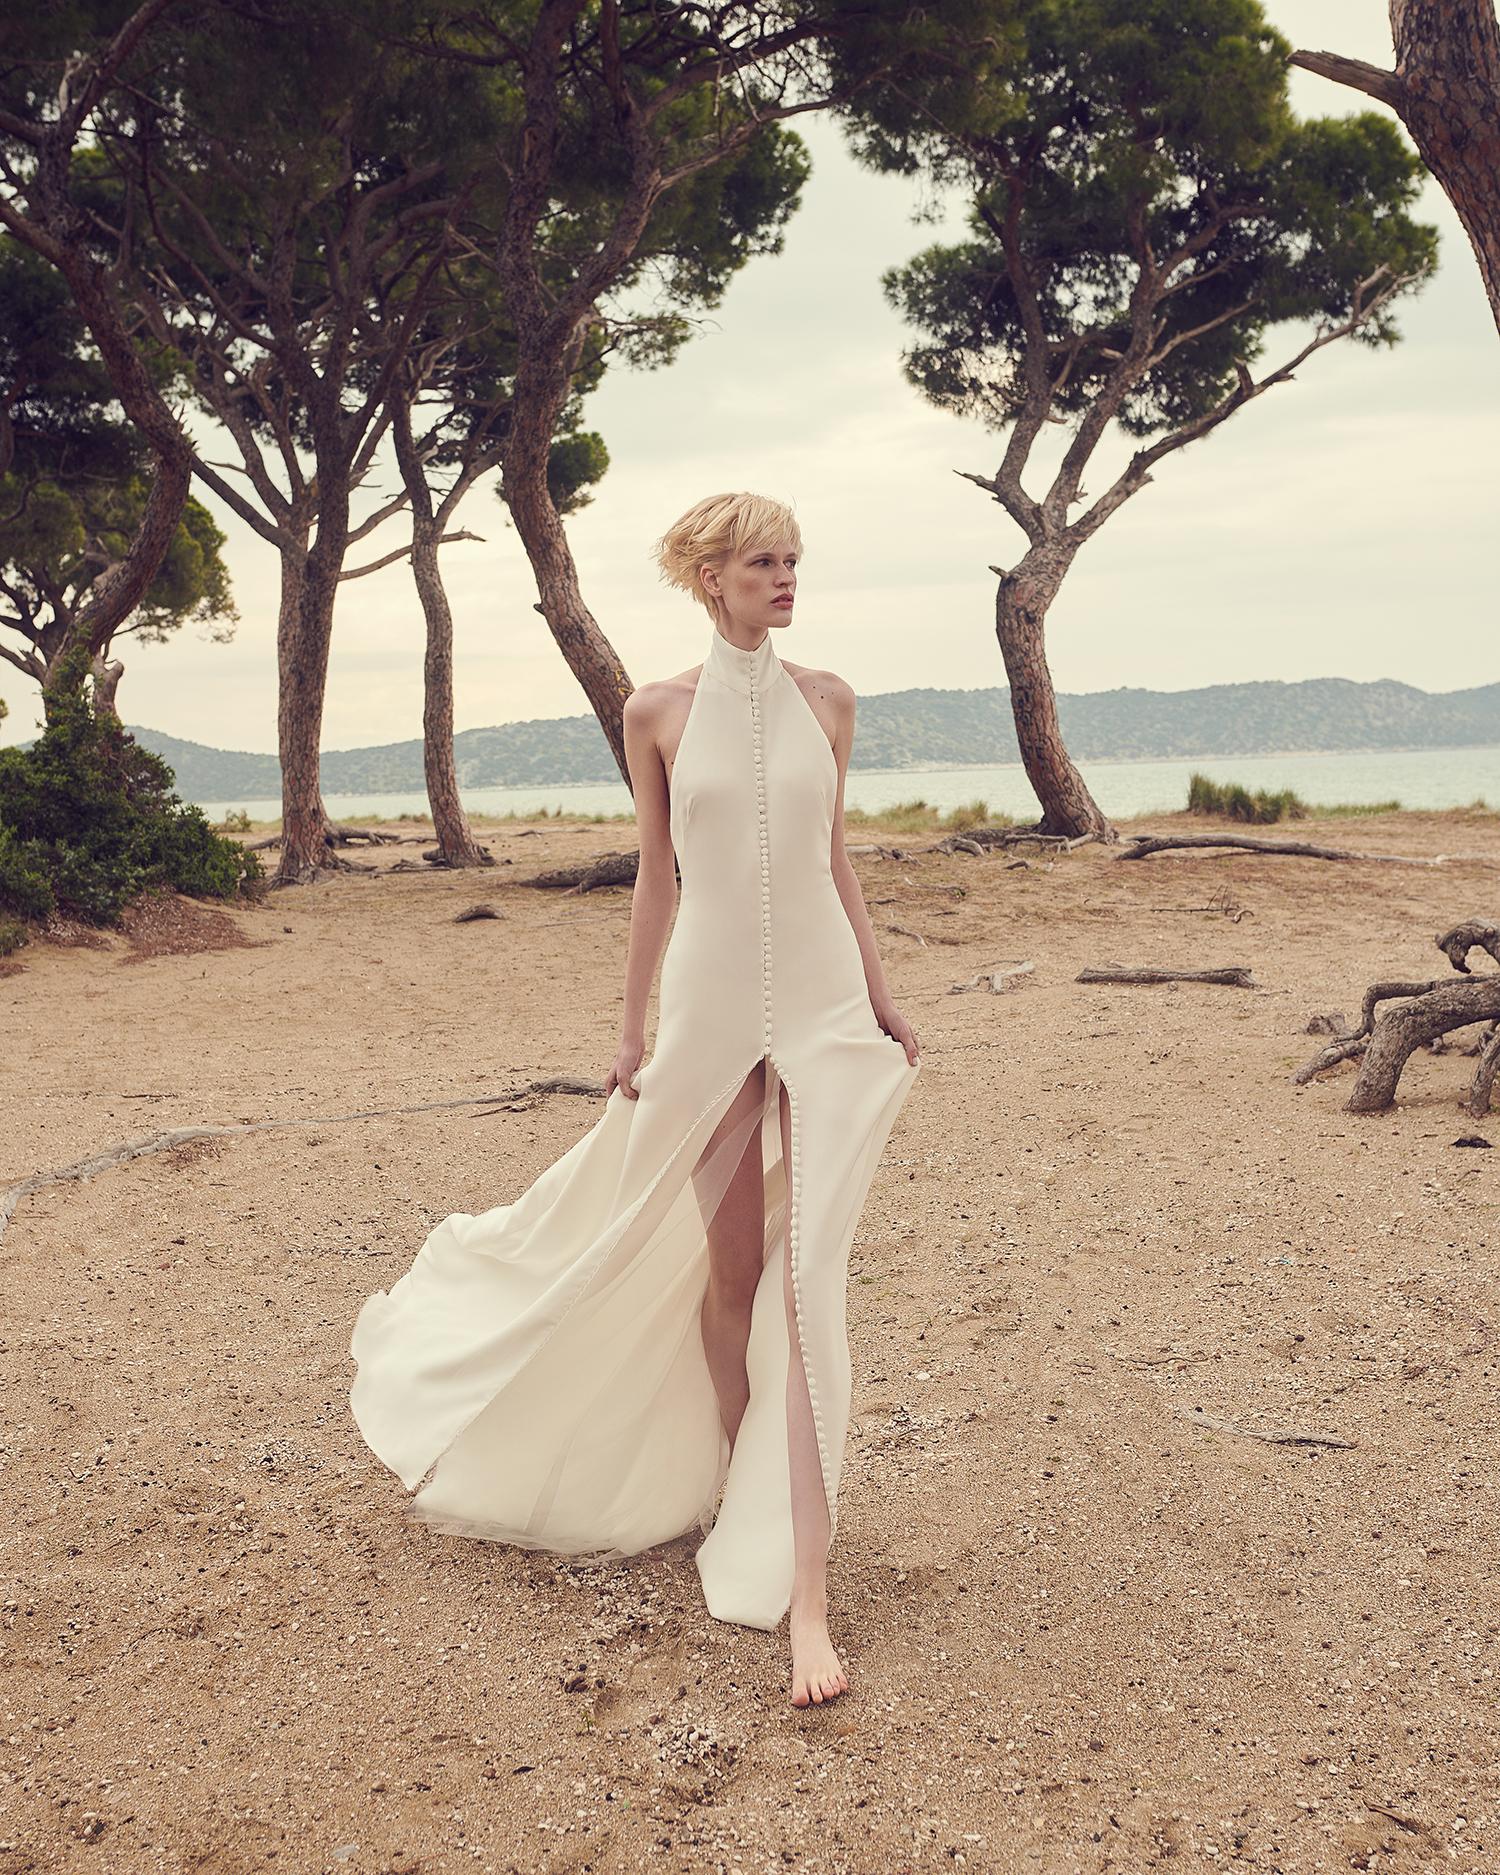 costarellos halter top sleeveless high slit wedding dress spring 2020